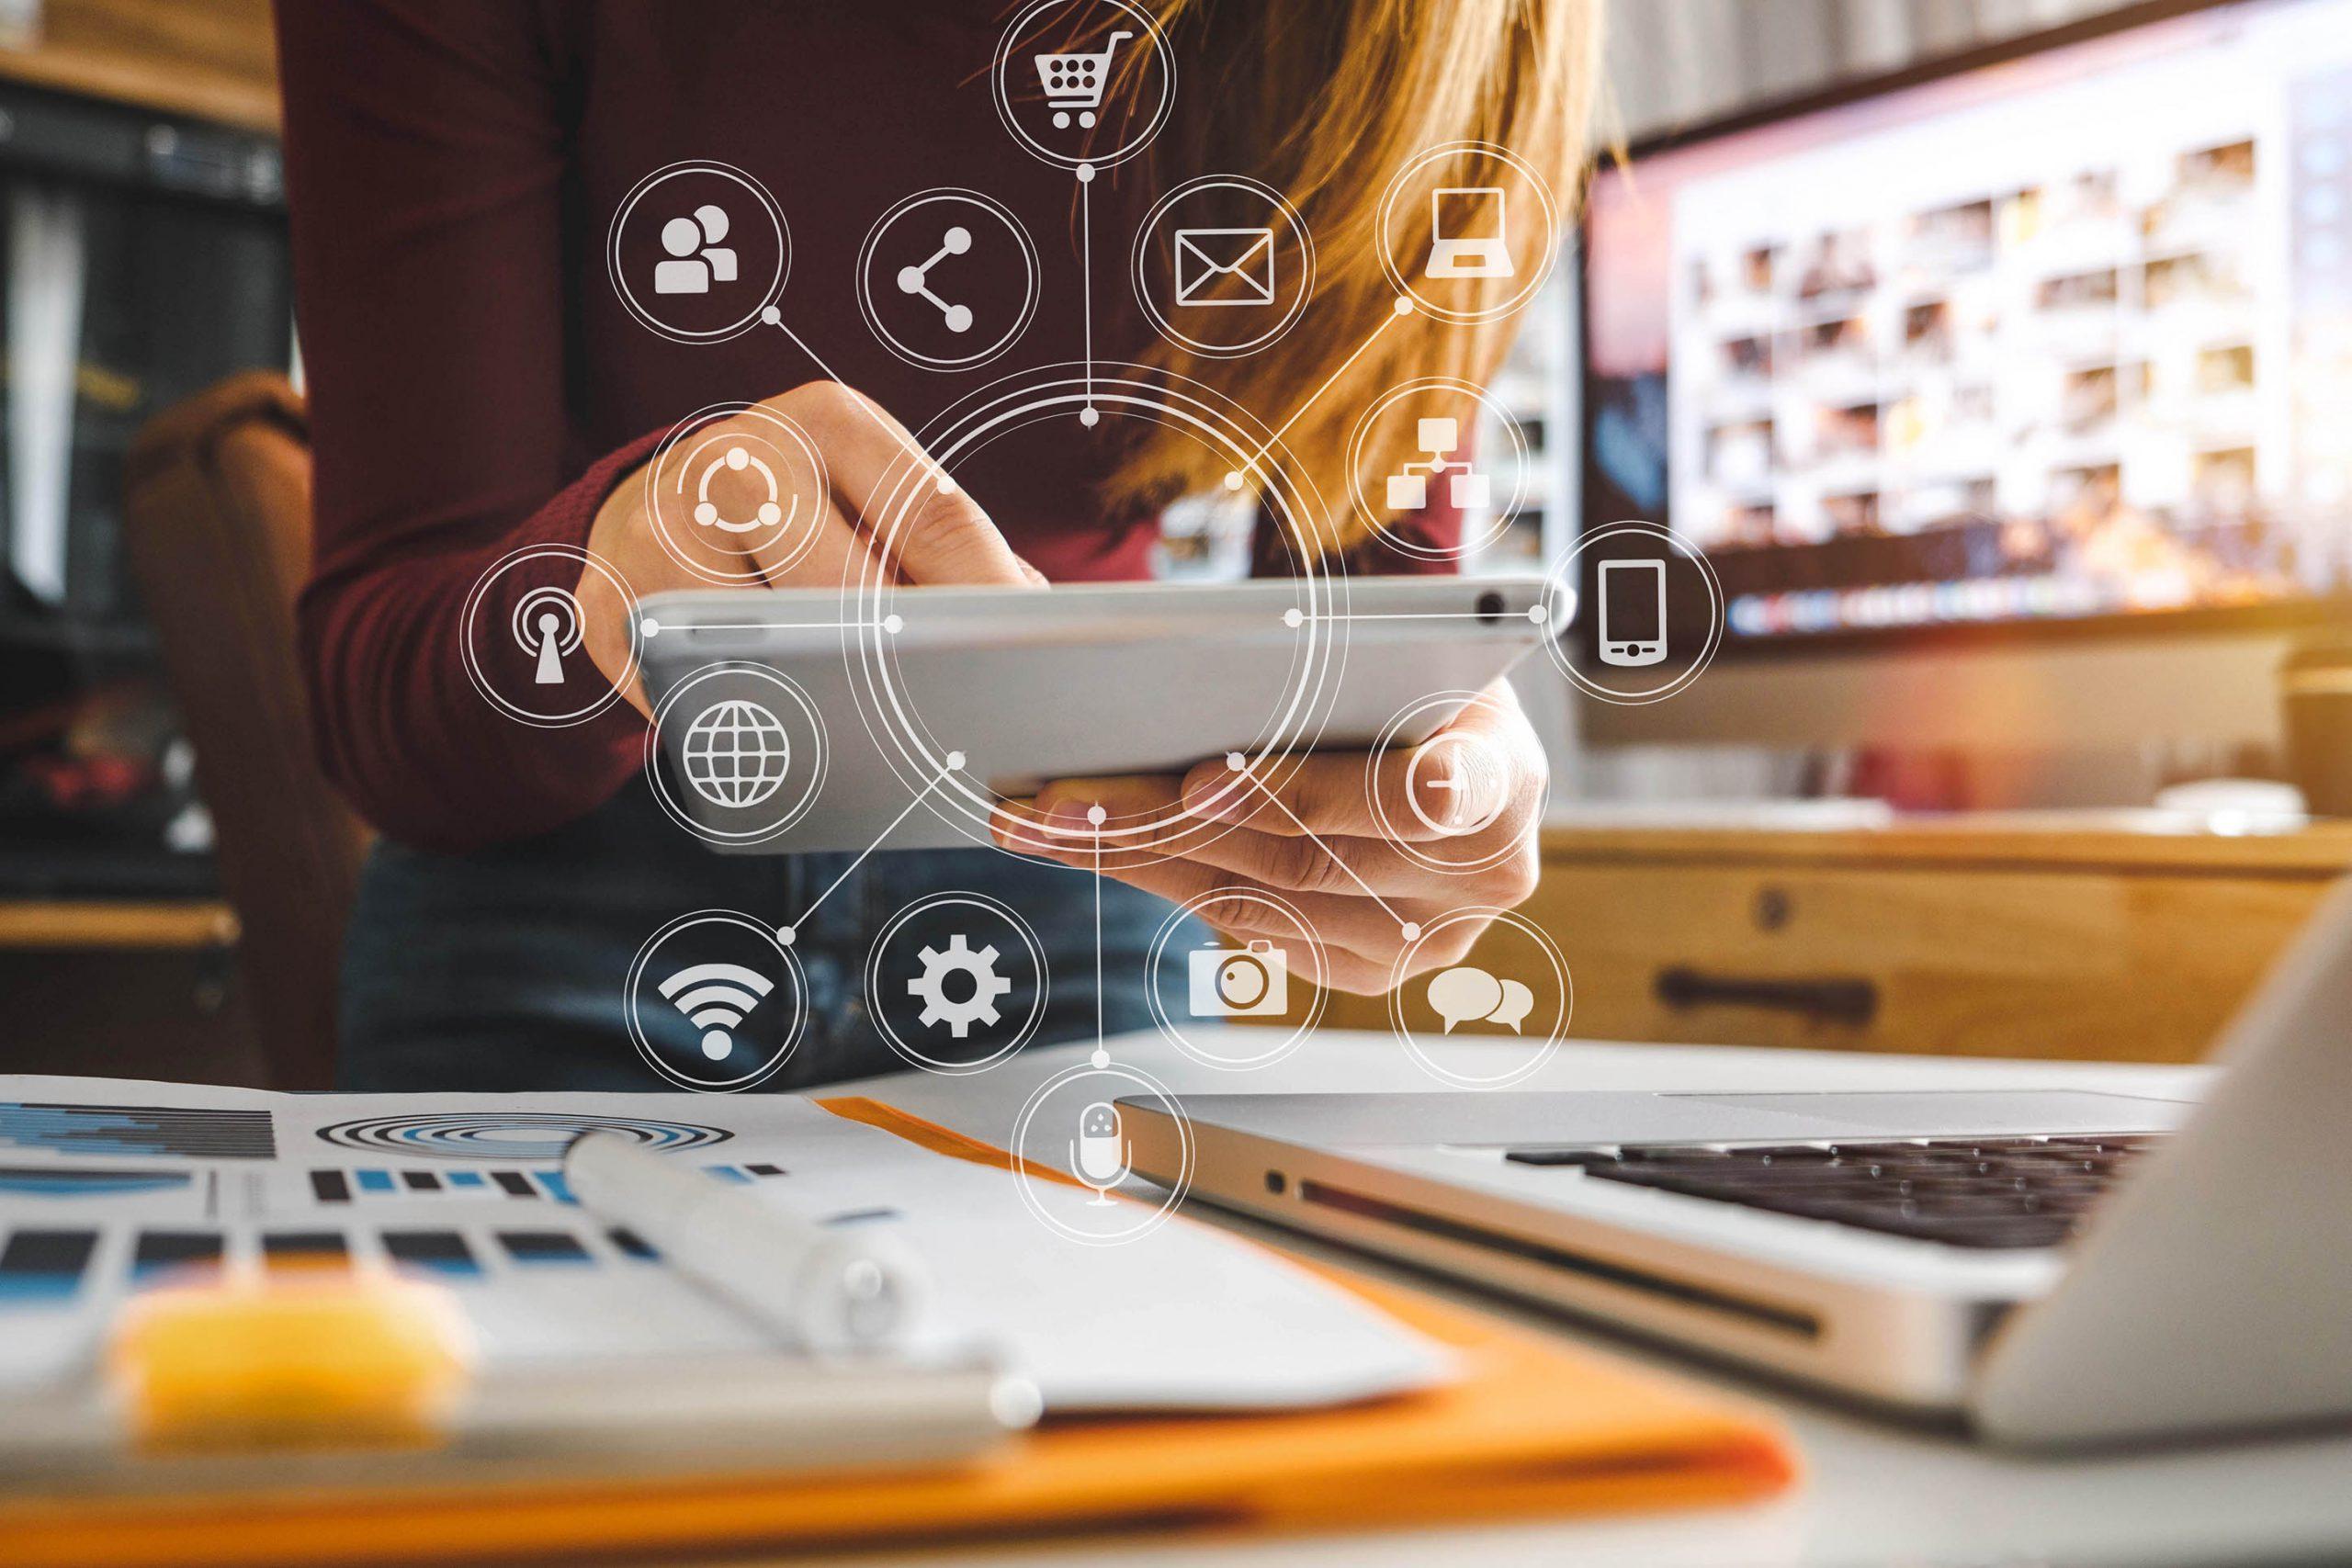 Enterprise Transformation Digital Technology